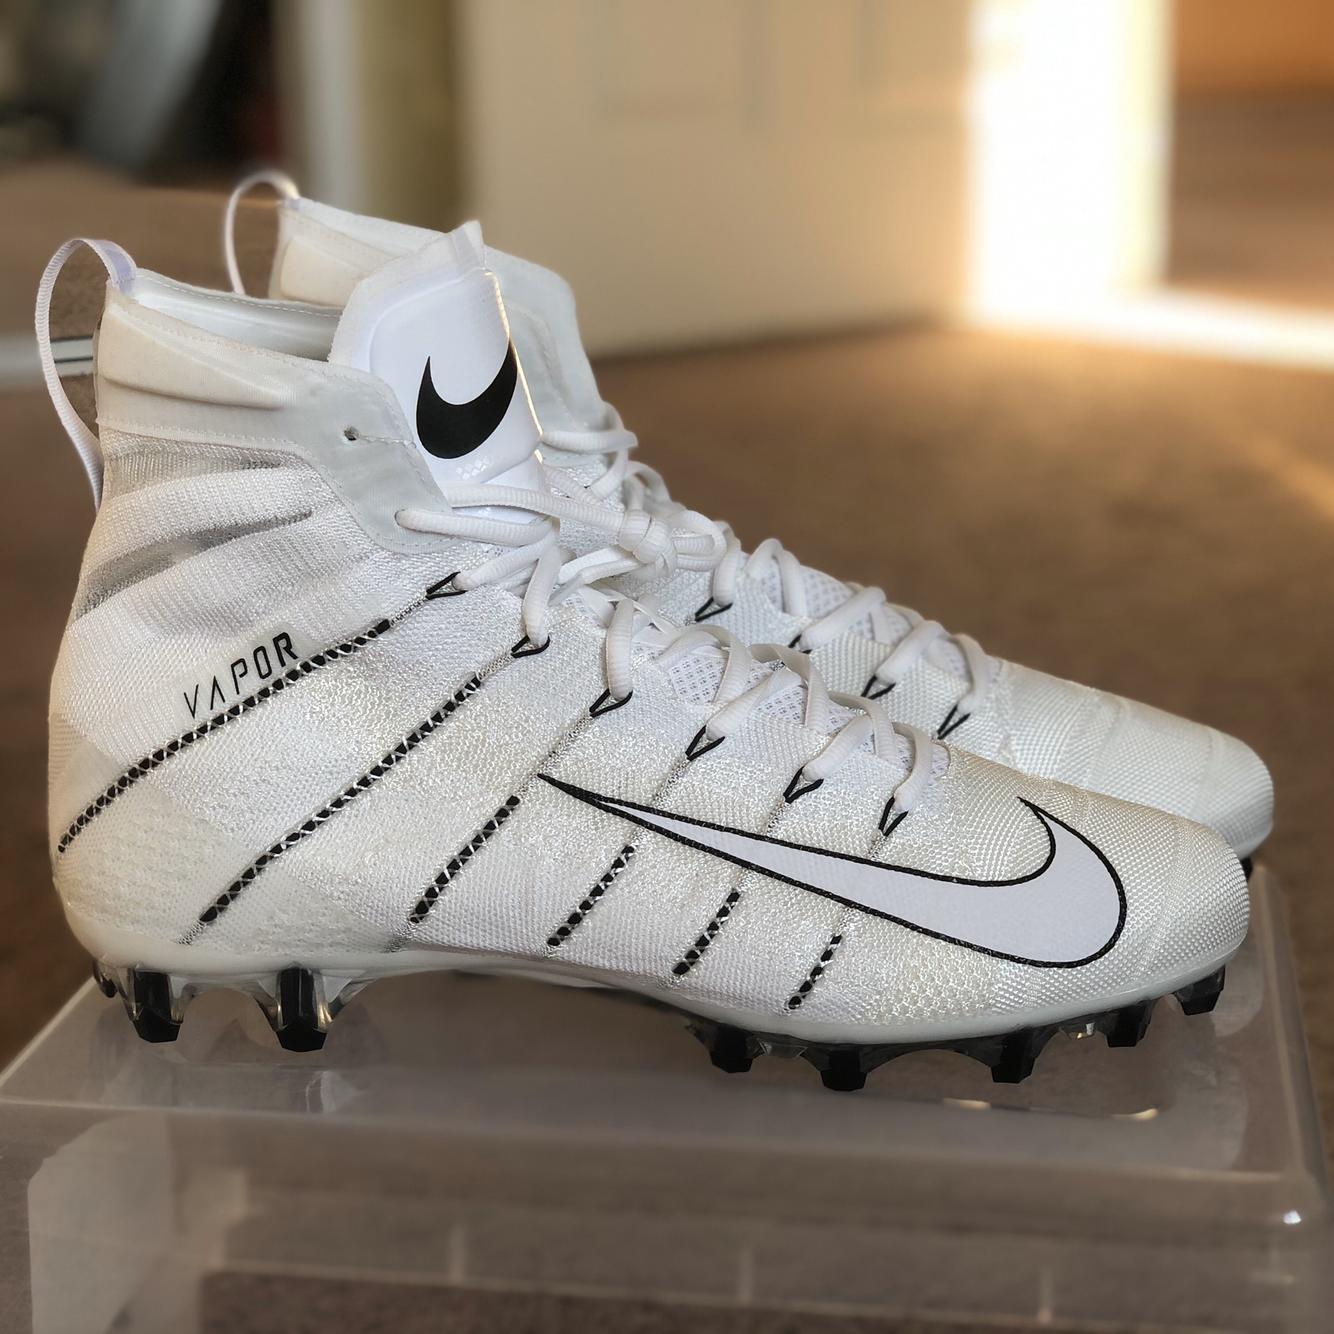 Nike Vapor Untouchable 3 Elite (Sz 13